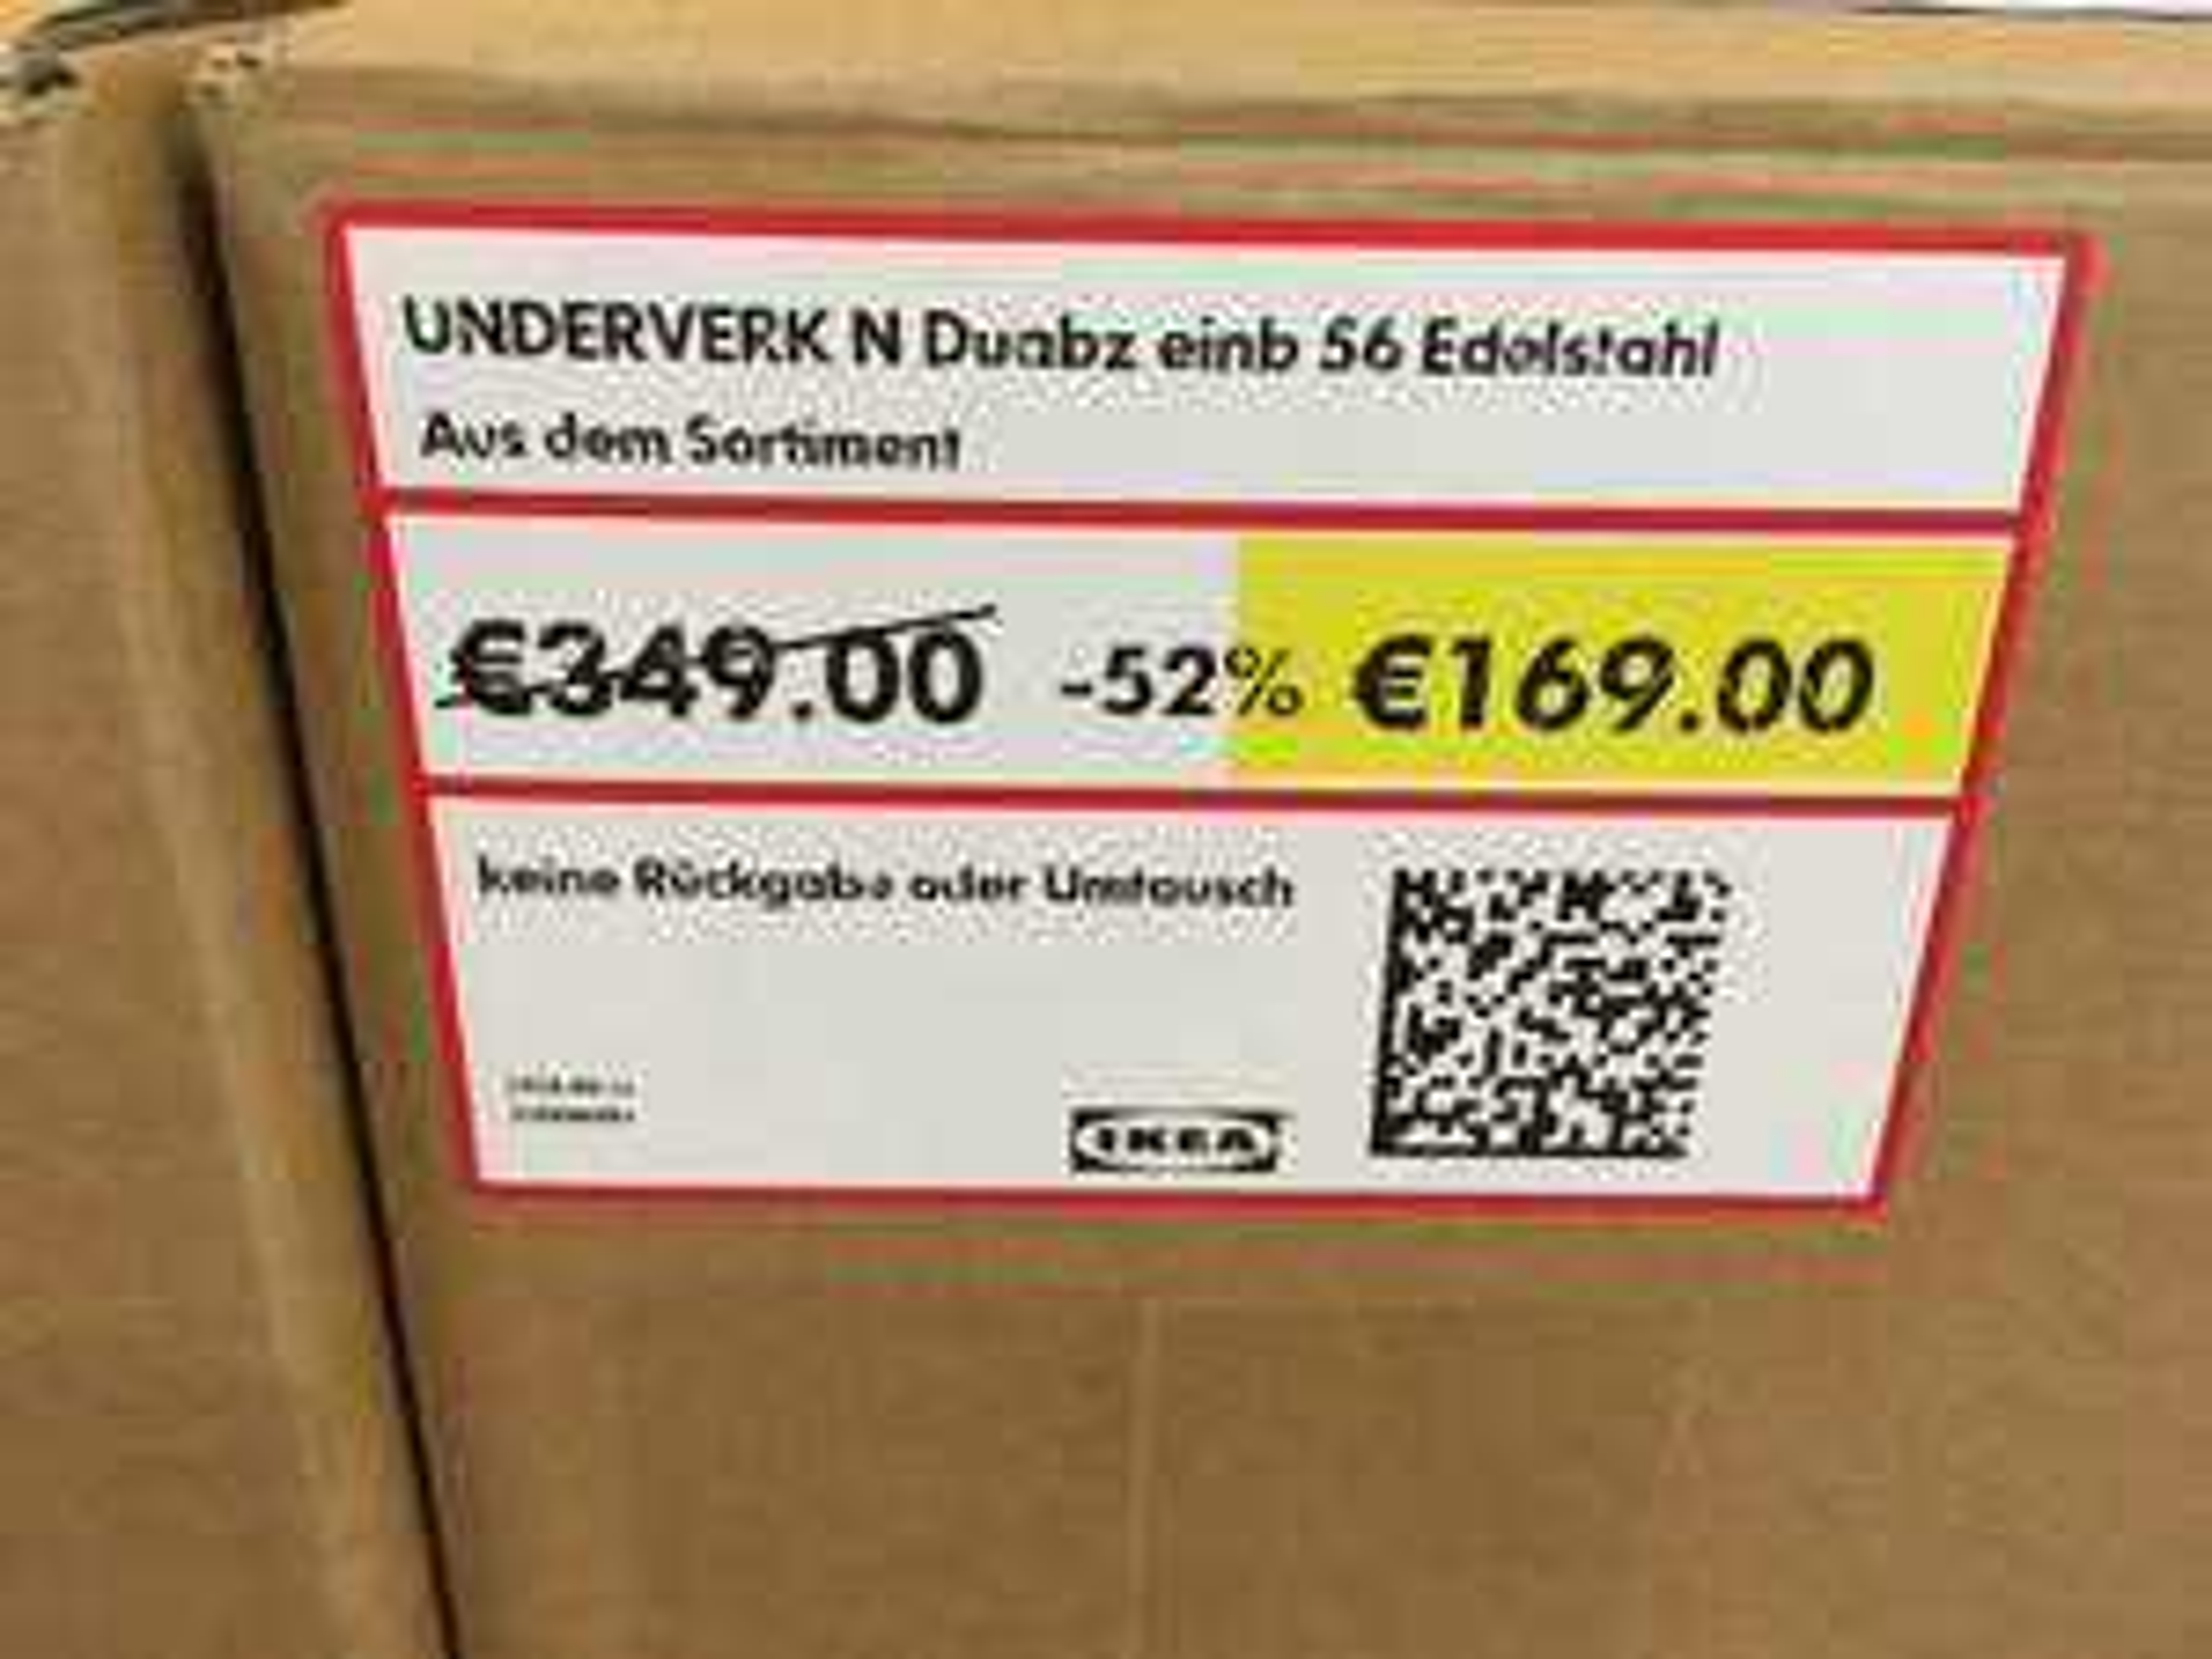 Lokal IKEA HH Moorfleet Underverk Dunstabzug Einbauhaube 56cm